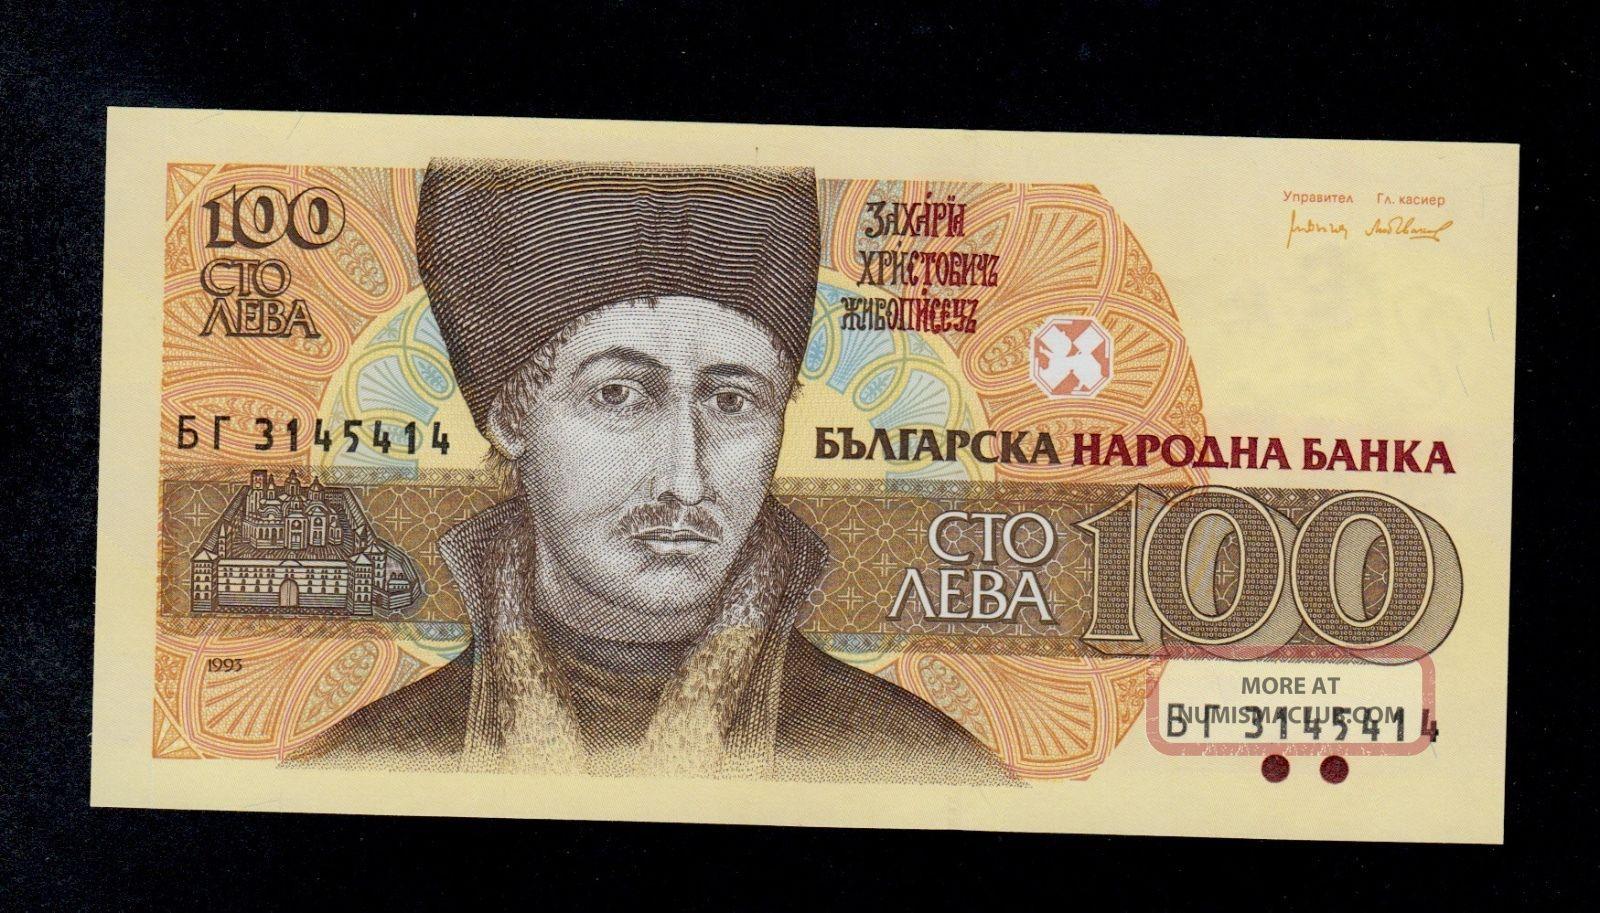 Bulgaria 100 Leva 1993 БГ Pick 102b Unc Banknote. Europe photo